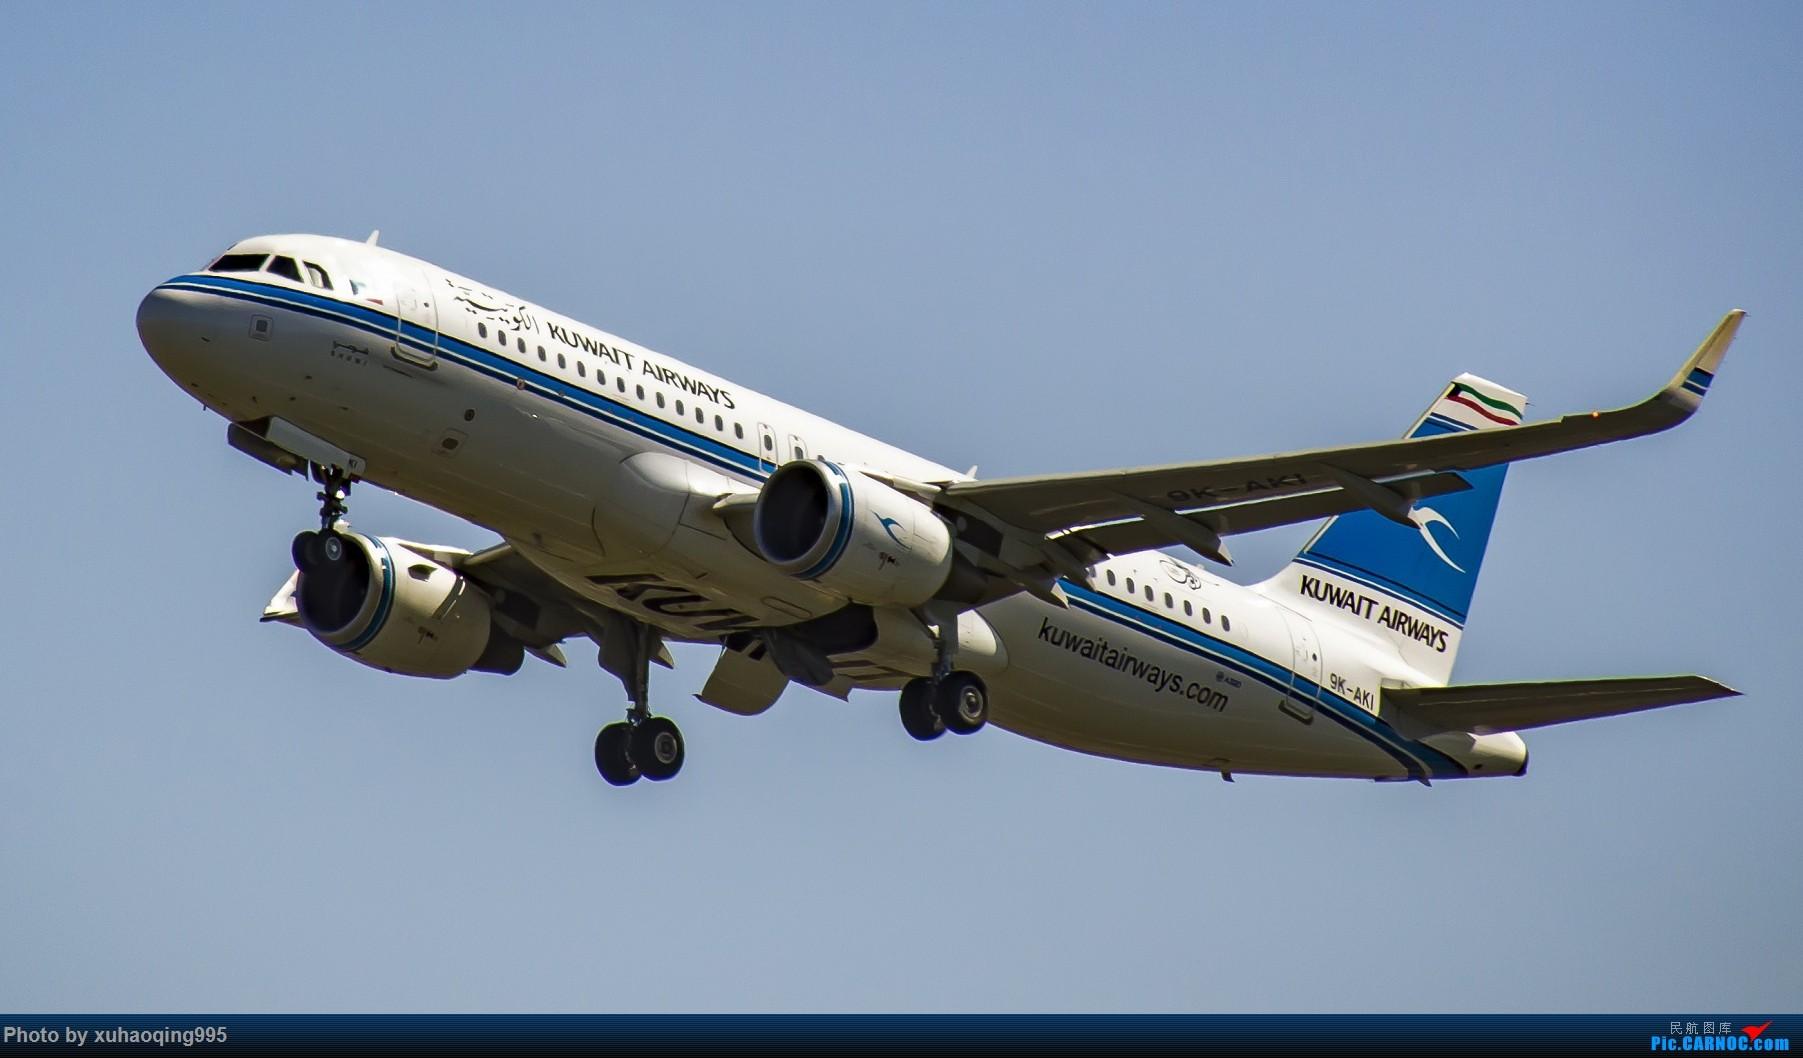 Re:[原创]罗马机场(FCO)拍机 AIRBUS A320 9K-AKI 意大利菲乌米奇诺机场